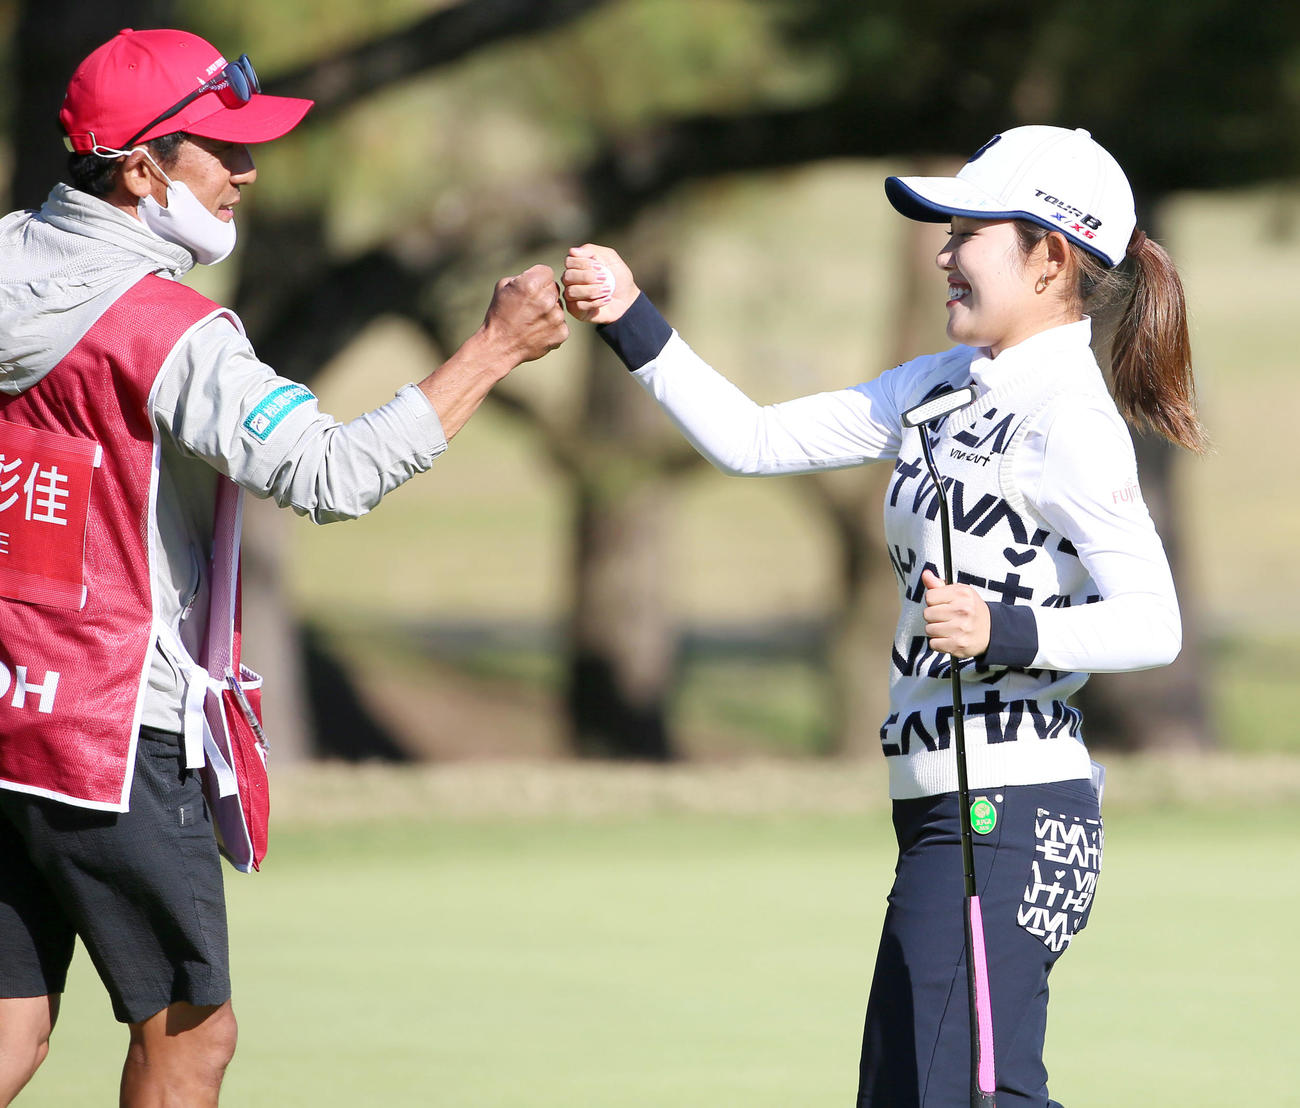 https://www.nikkansports.com/sports/golf/news/img/202011290000432-w1300_1.jpg